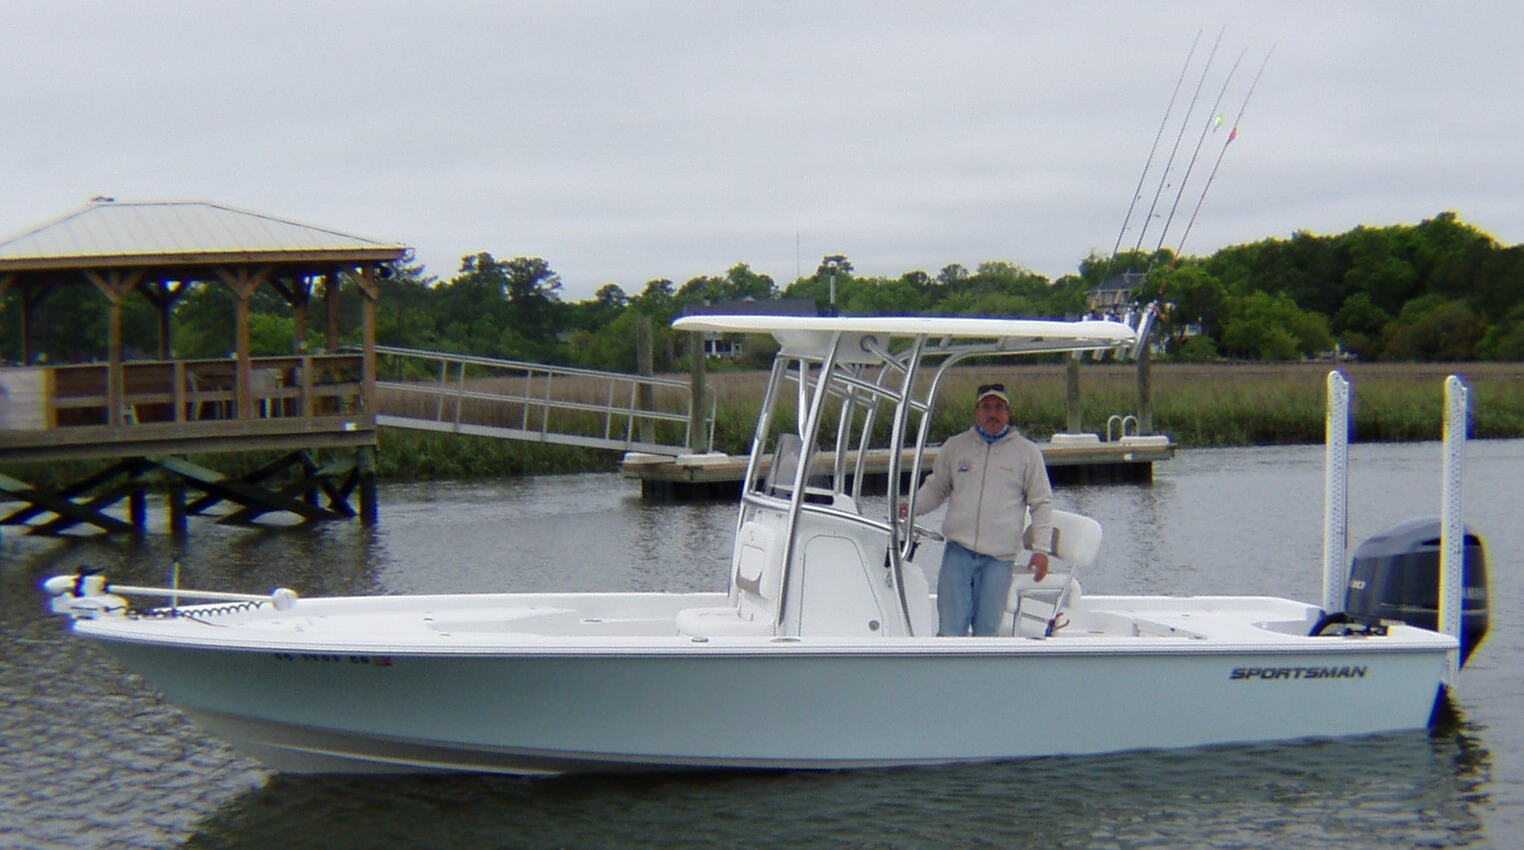 Rich's Boat